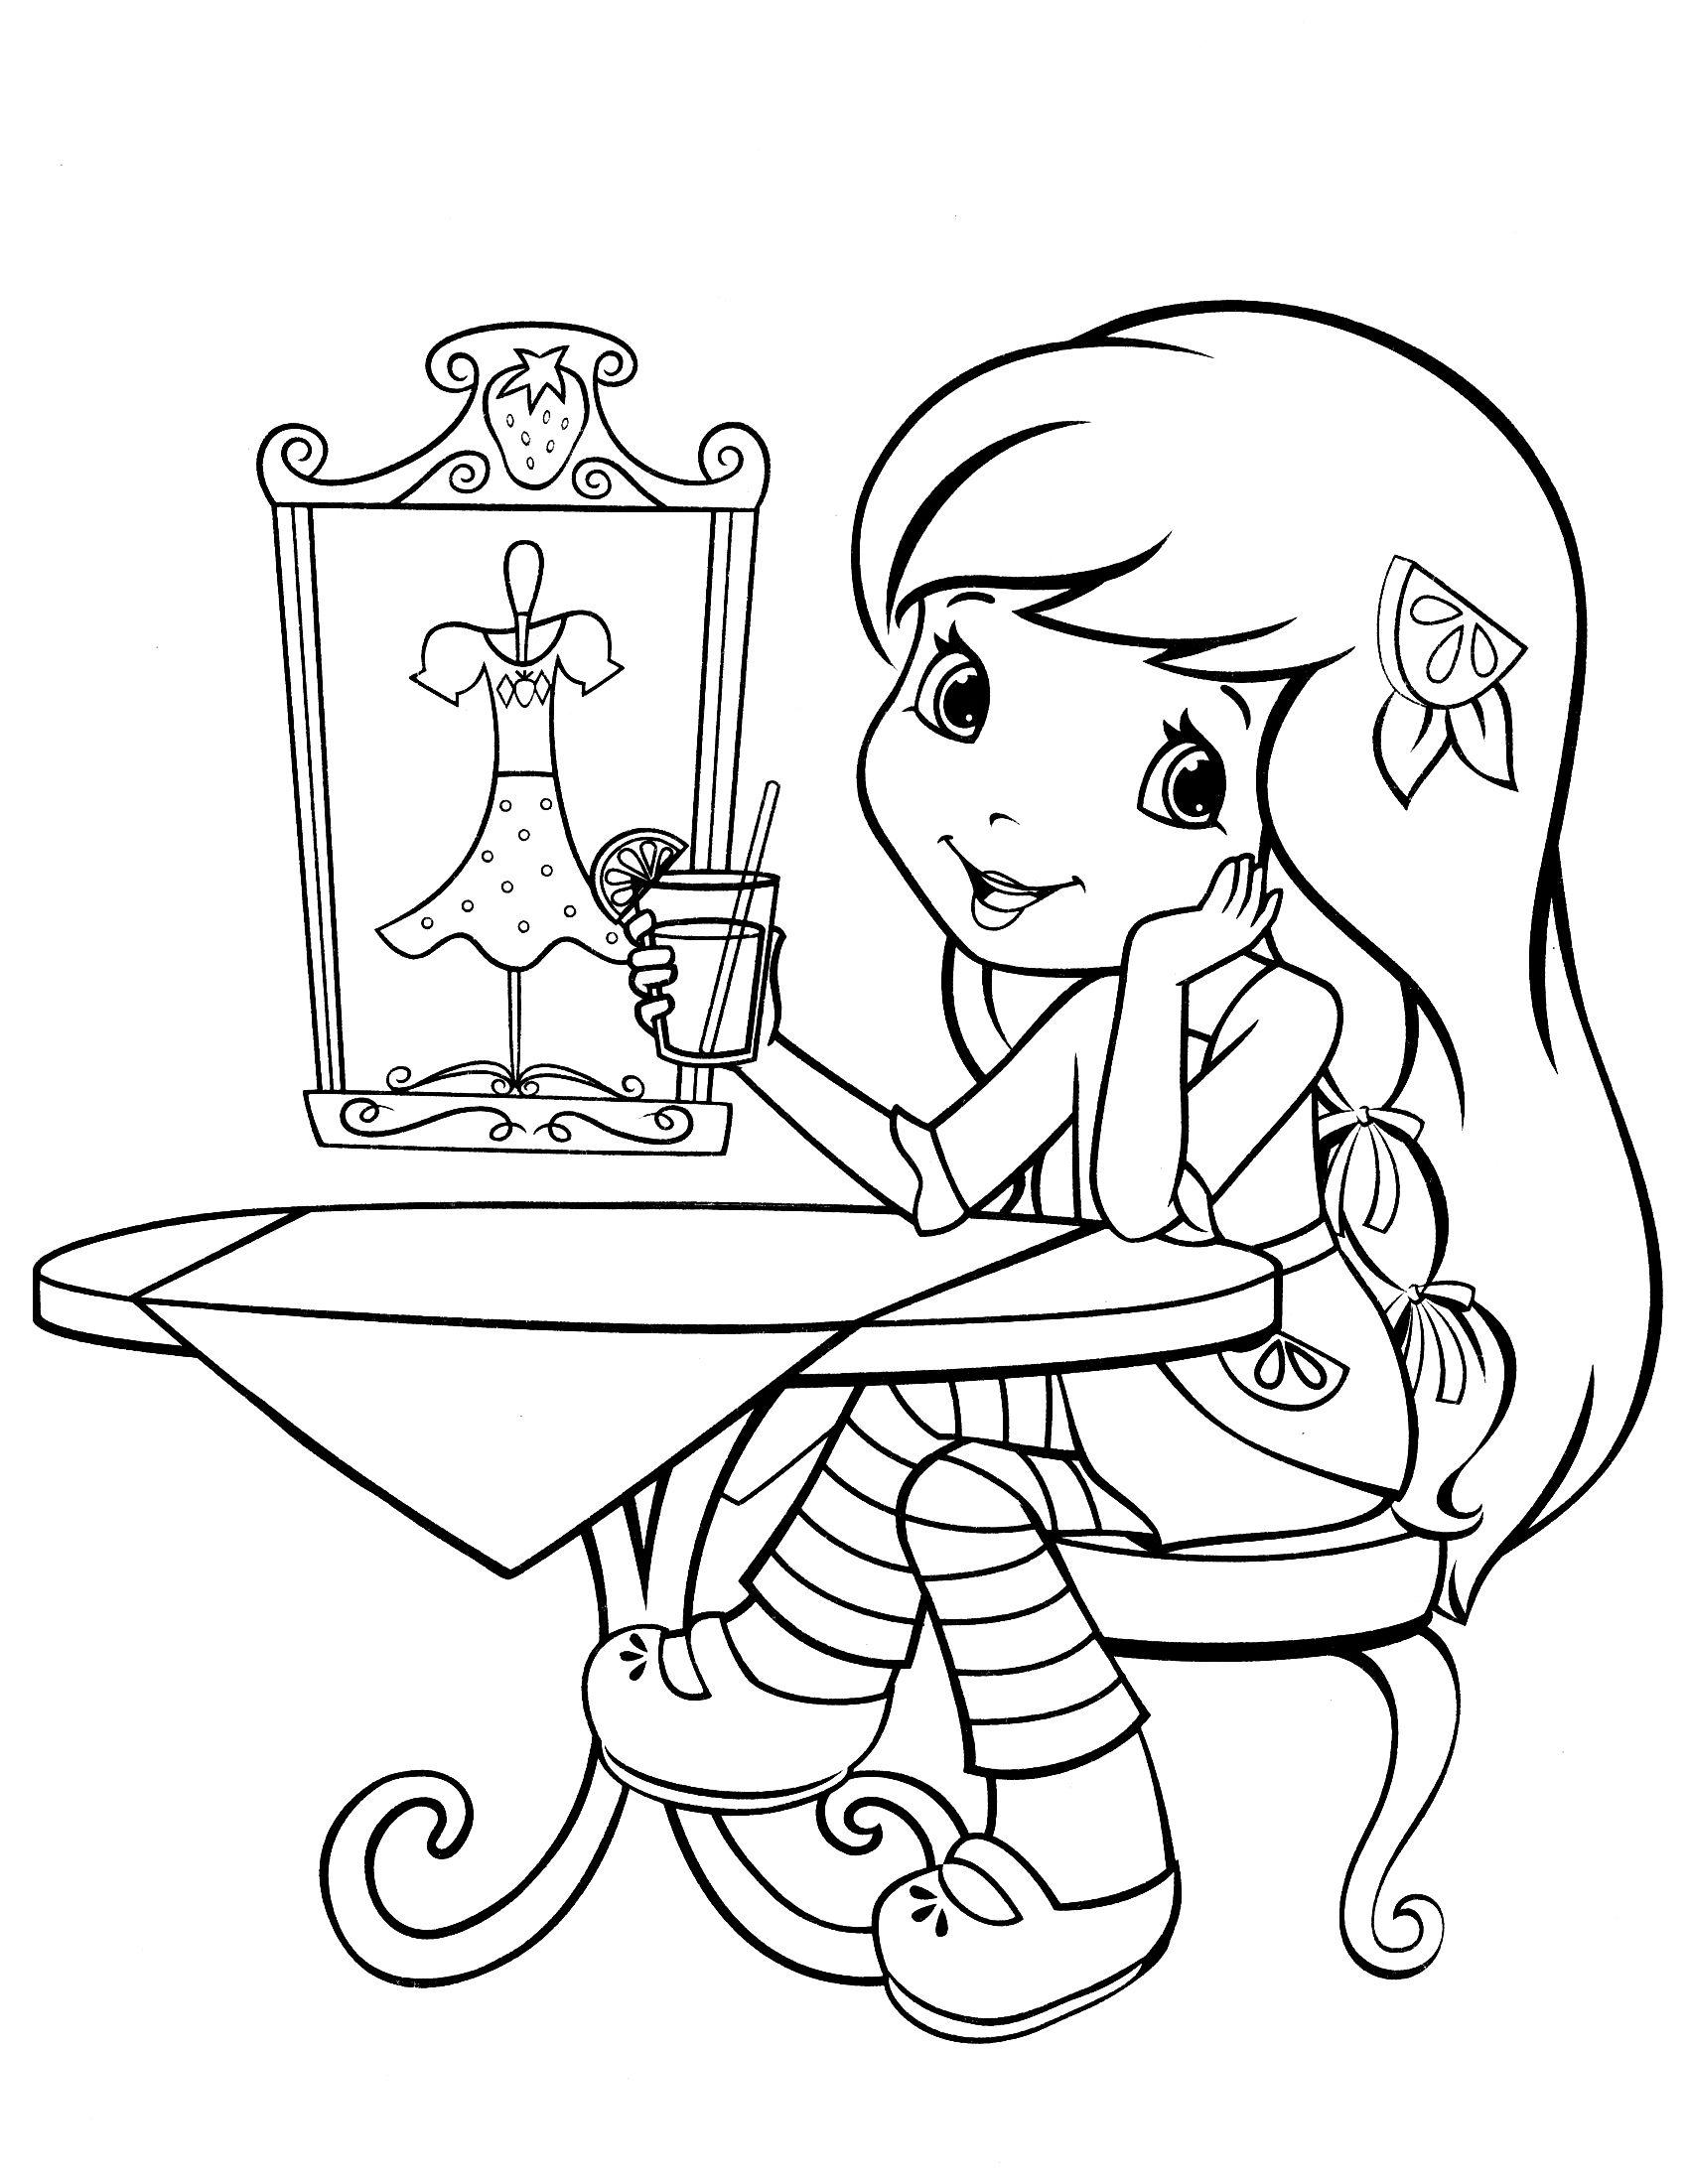 strawberry shortcake coloring page | fresitas | Pinterest ...